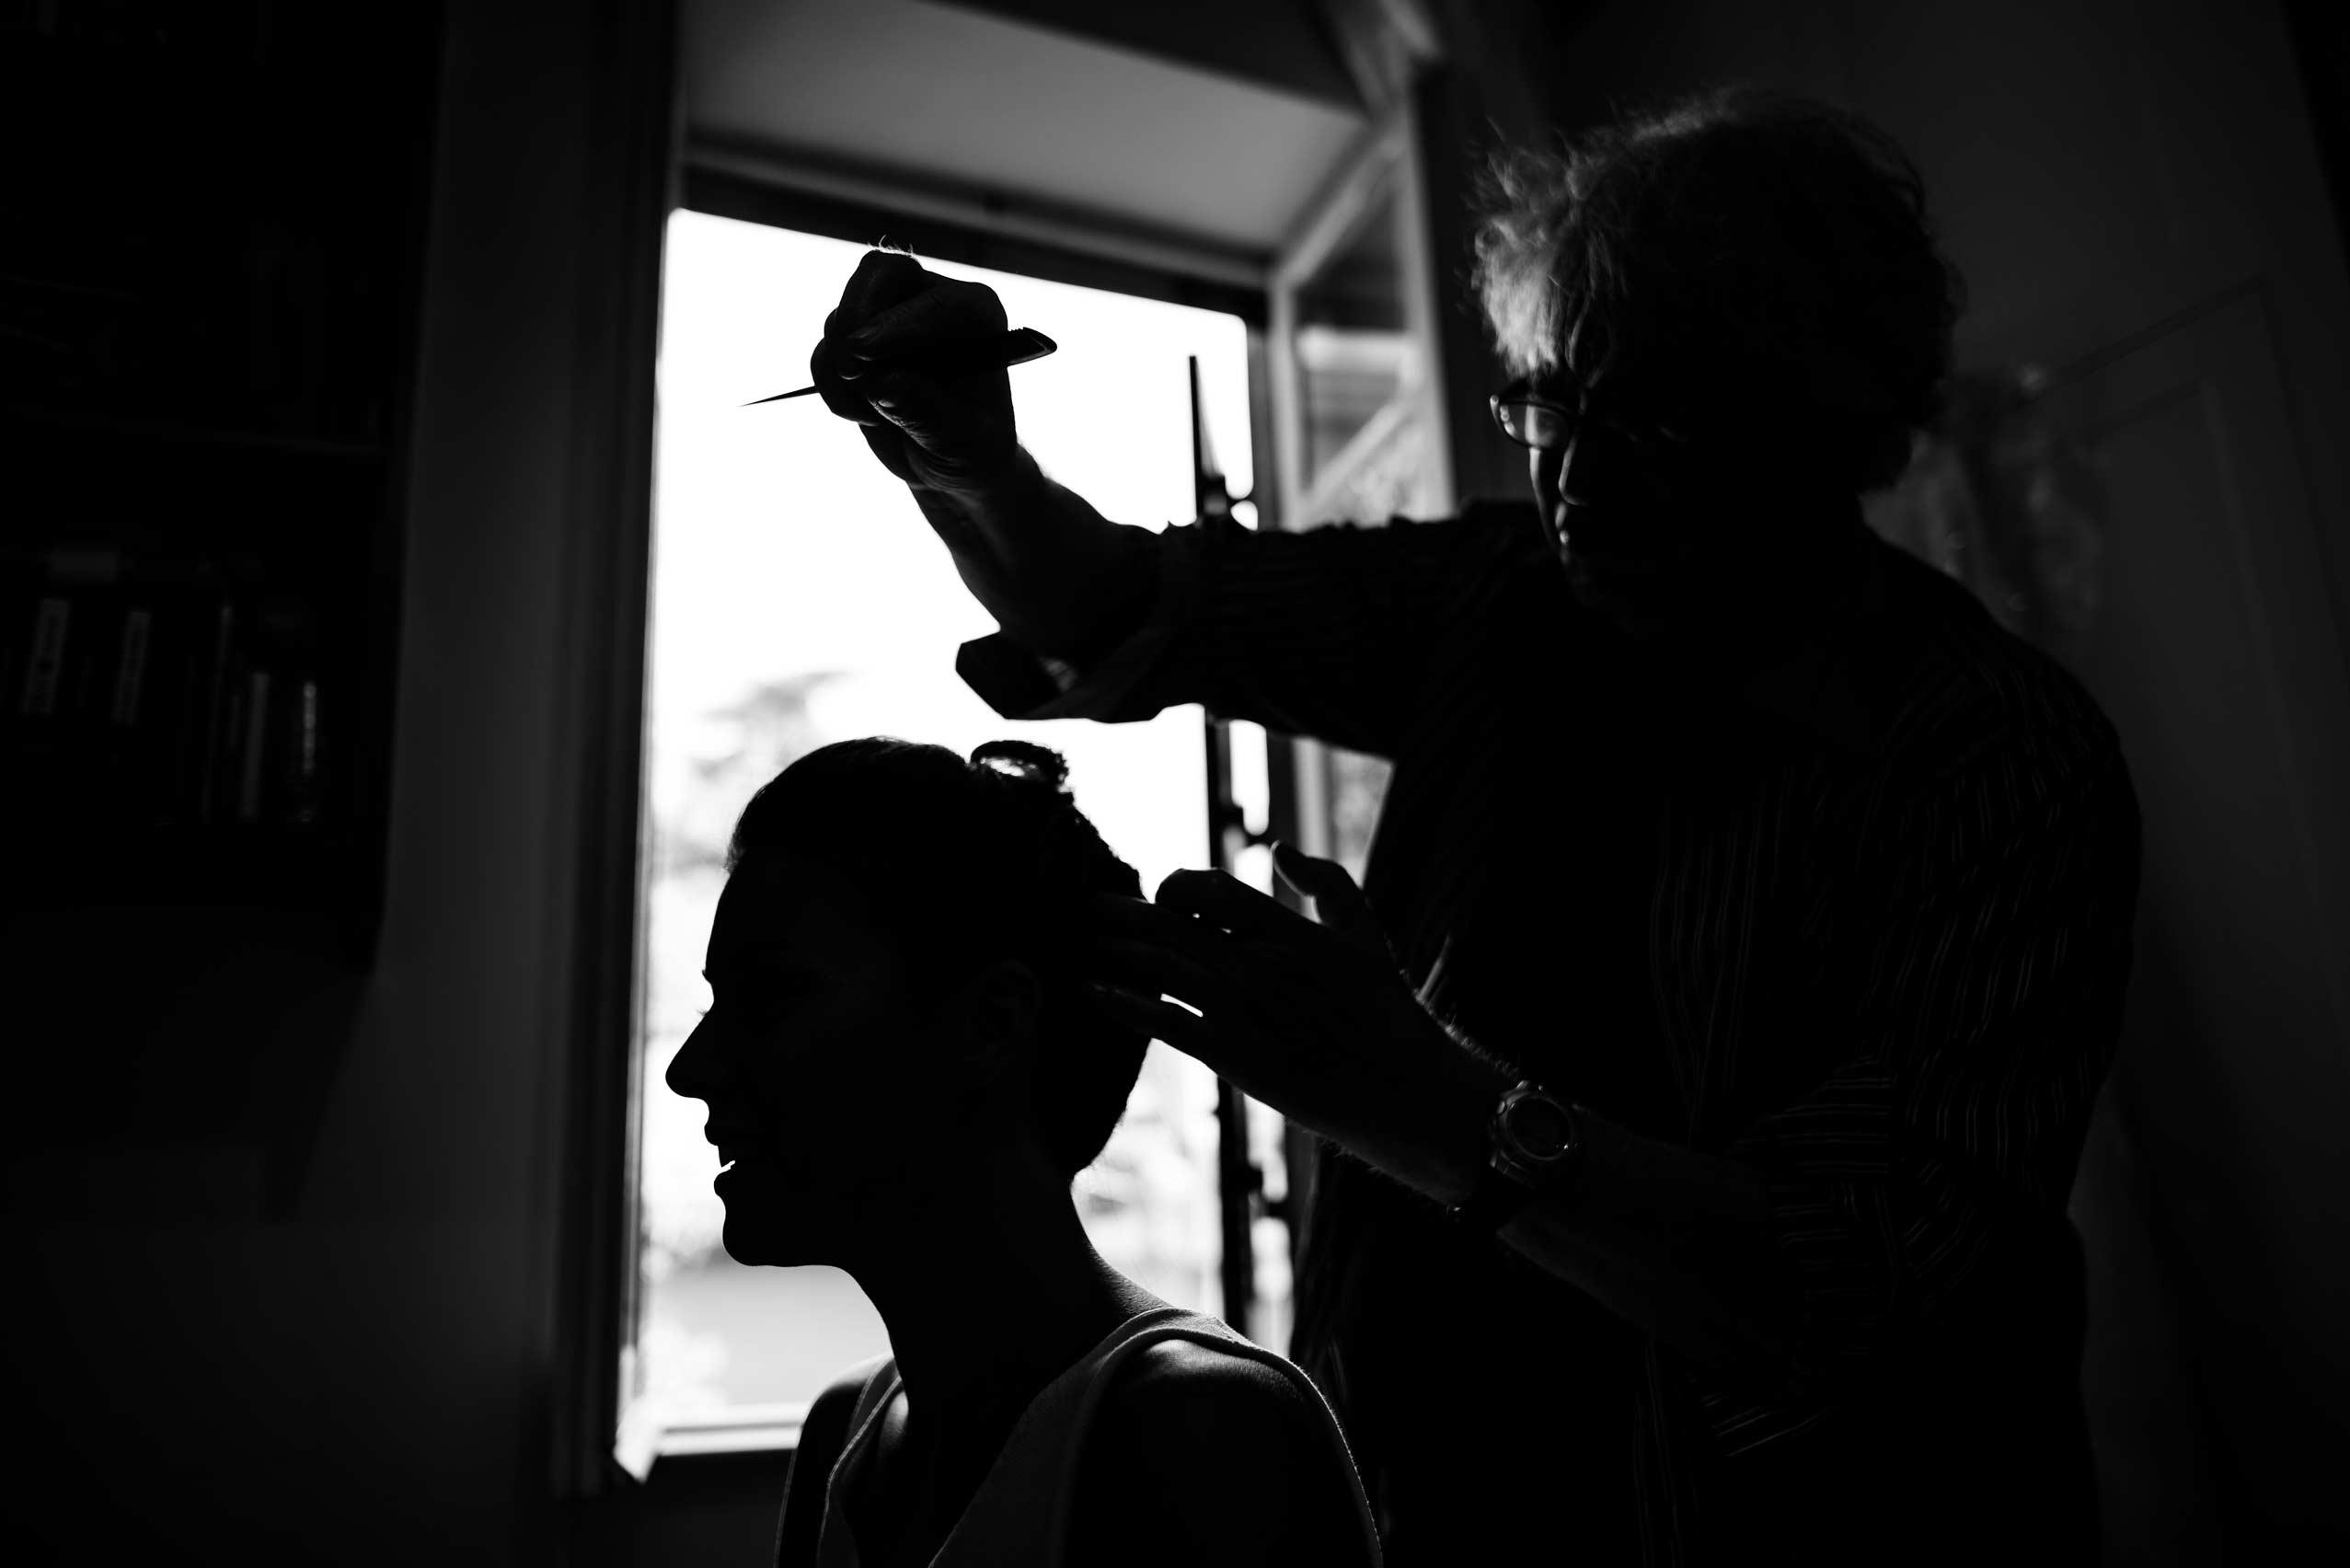 Matrimonio-Fotografo-Stile-Reportage-Roma-Preparativi-Sposa